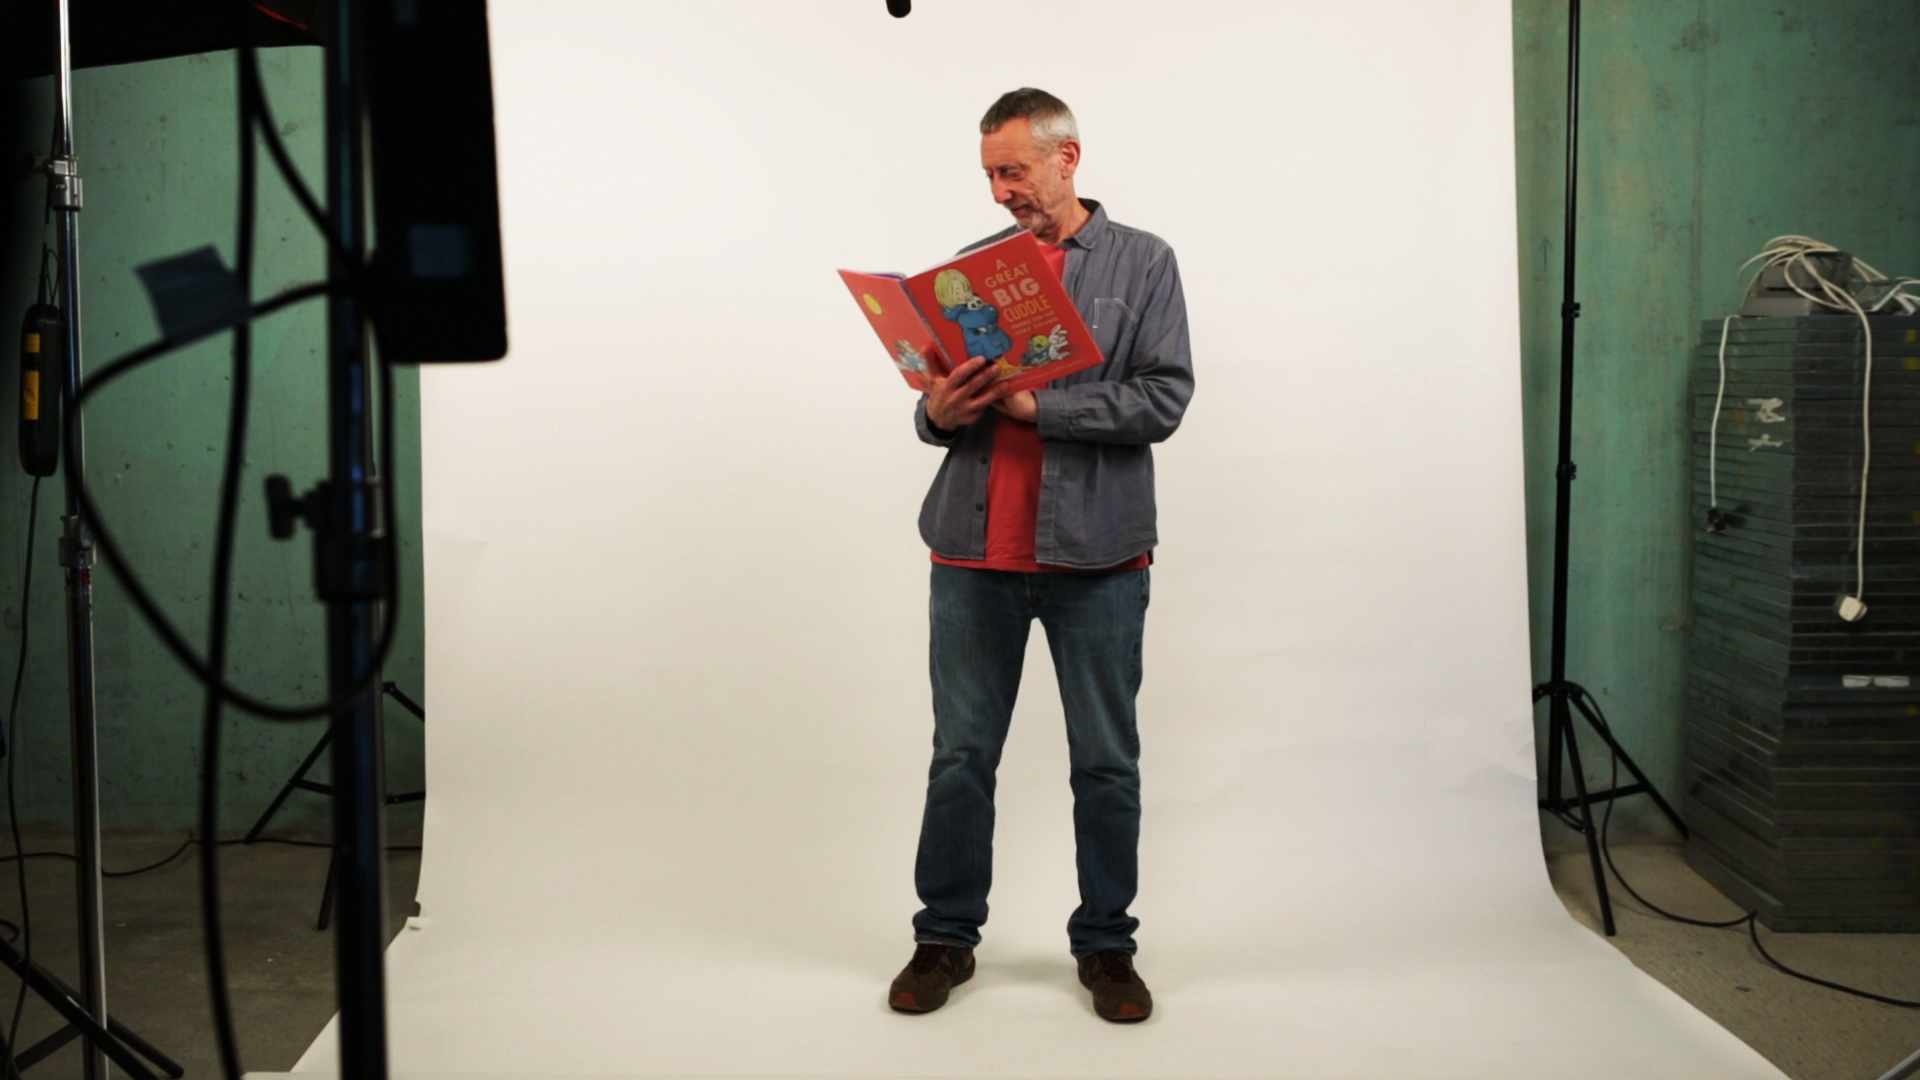 Michael Rosen reading from 'A Great Big Cuddle' in the FLETCHERWILSON studio.